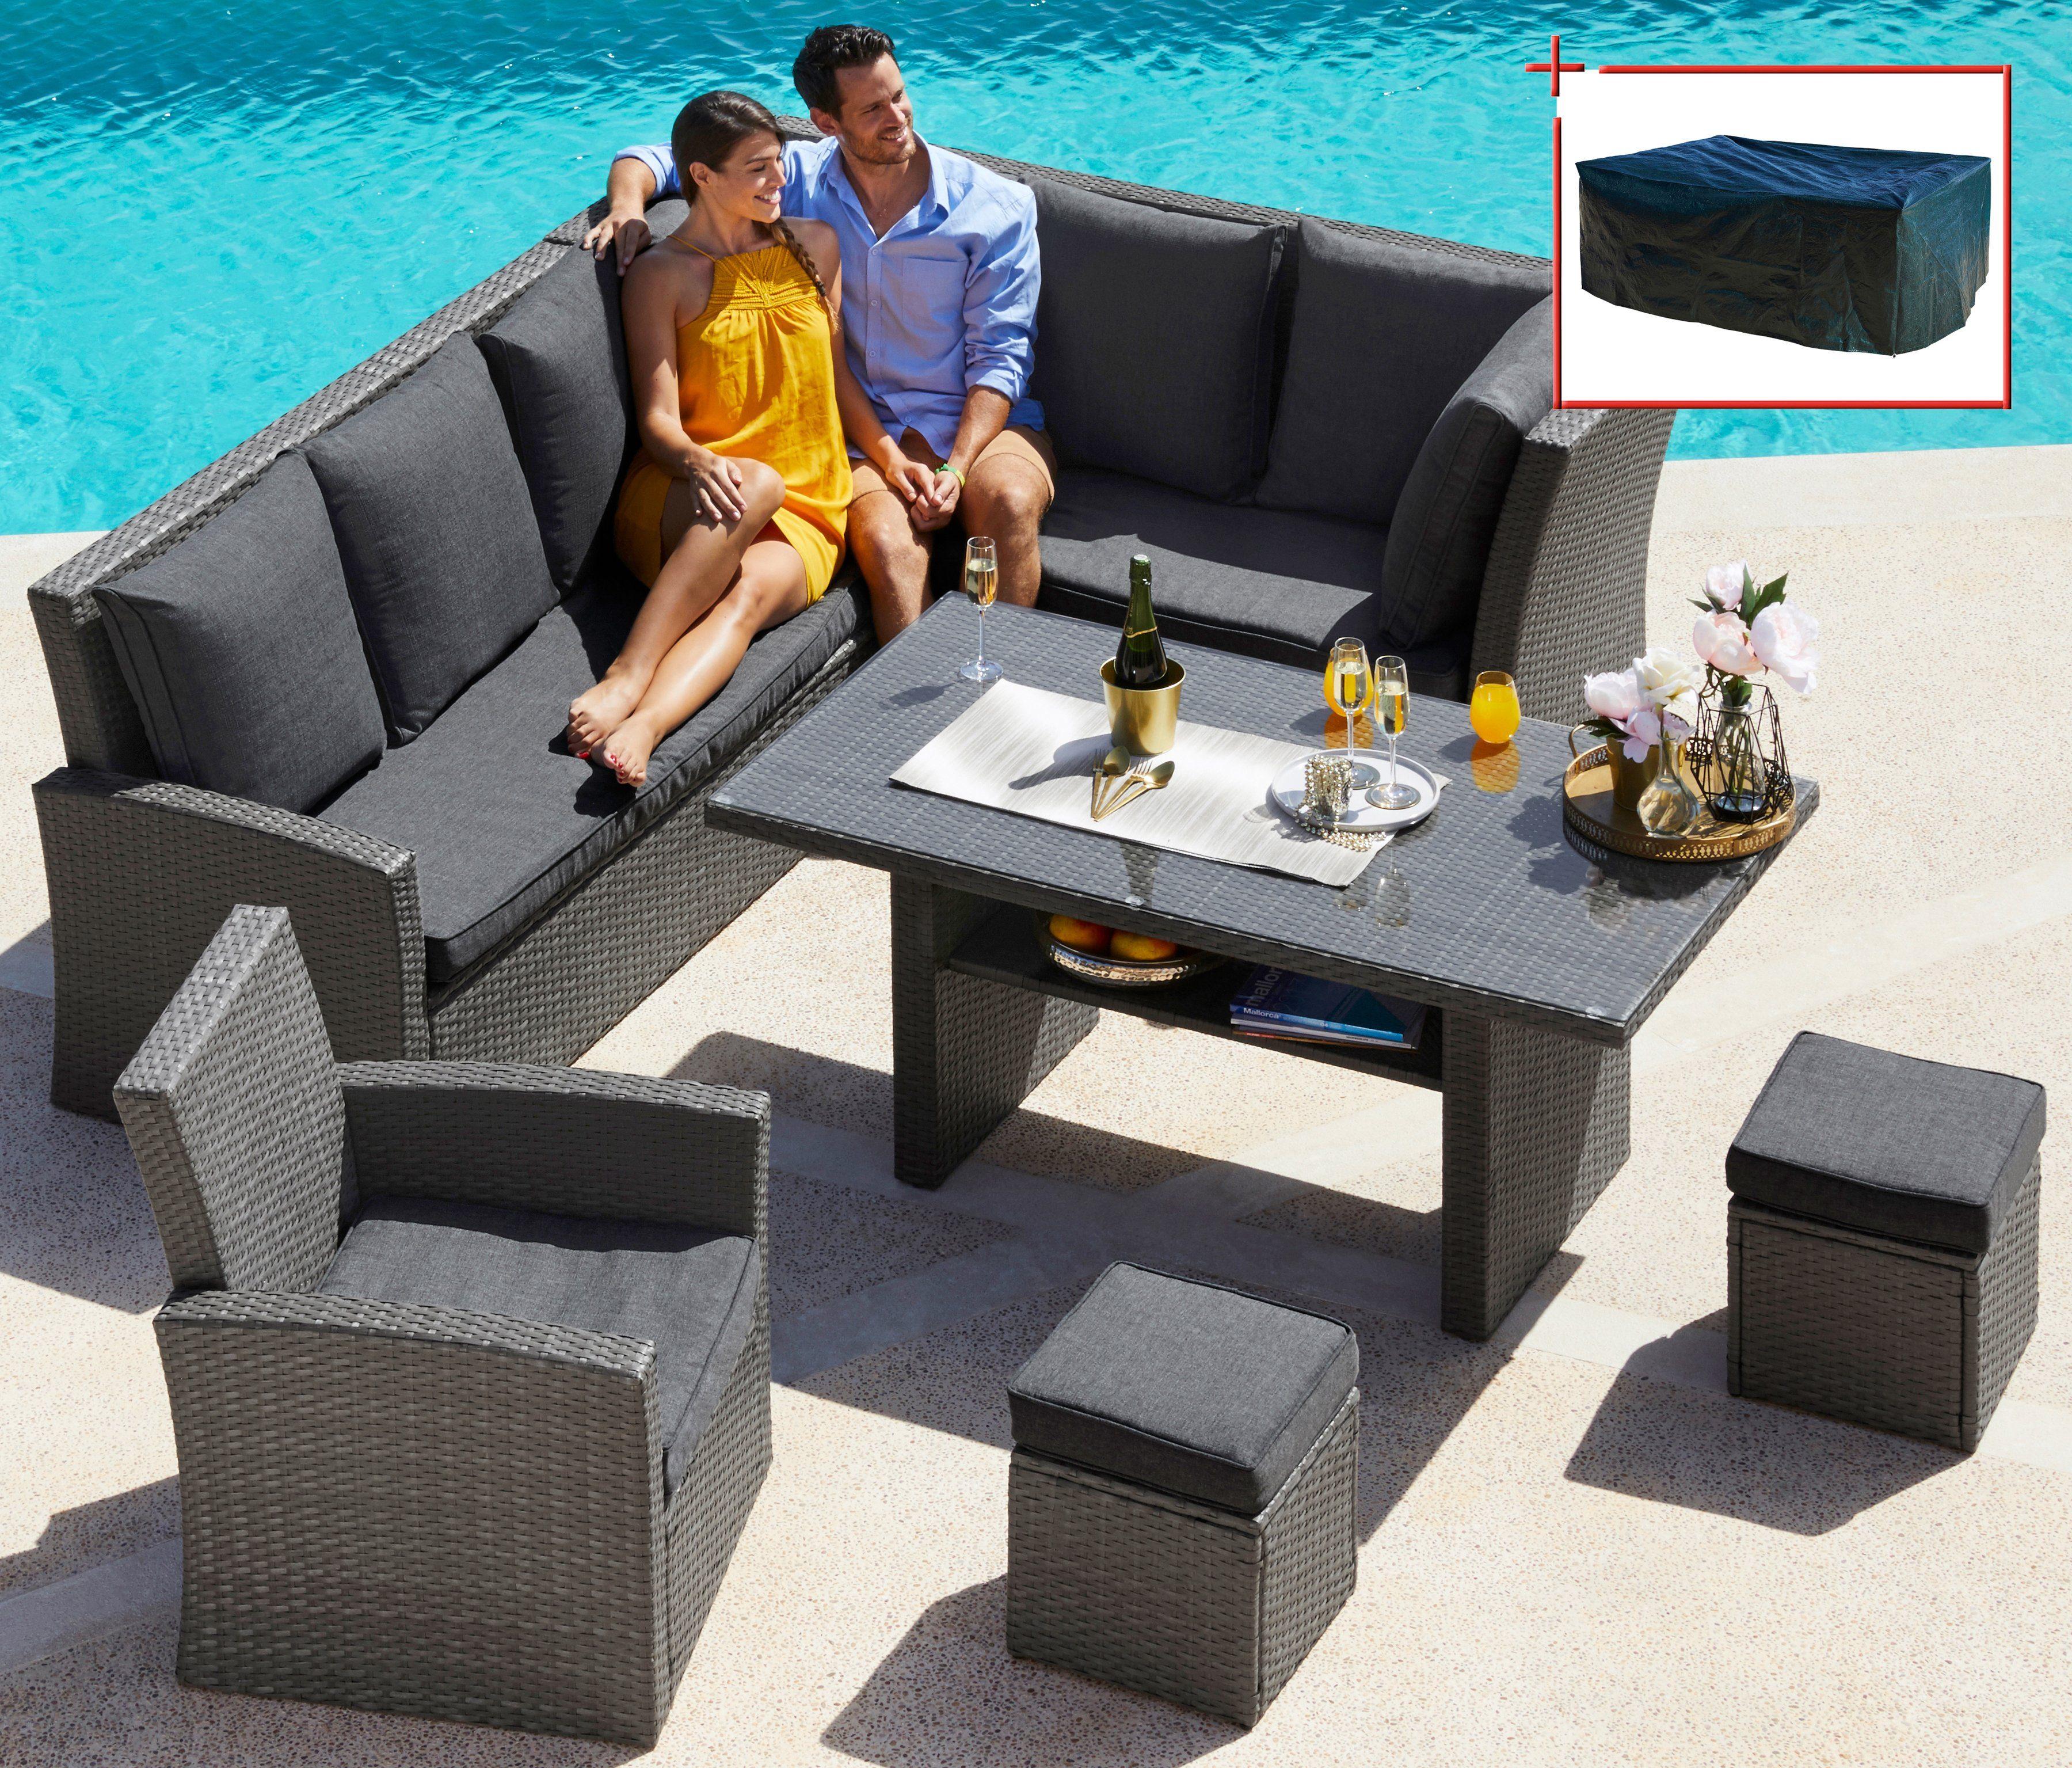 Loungeset »Santorini Premium«, 20-tlg. Eckbank, Sessel, 2 Hocker, Tisch, Polyrattan